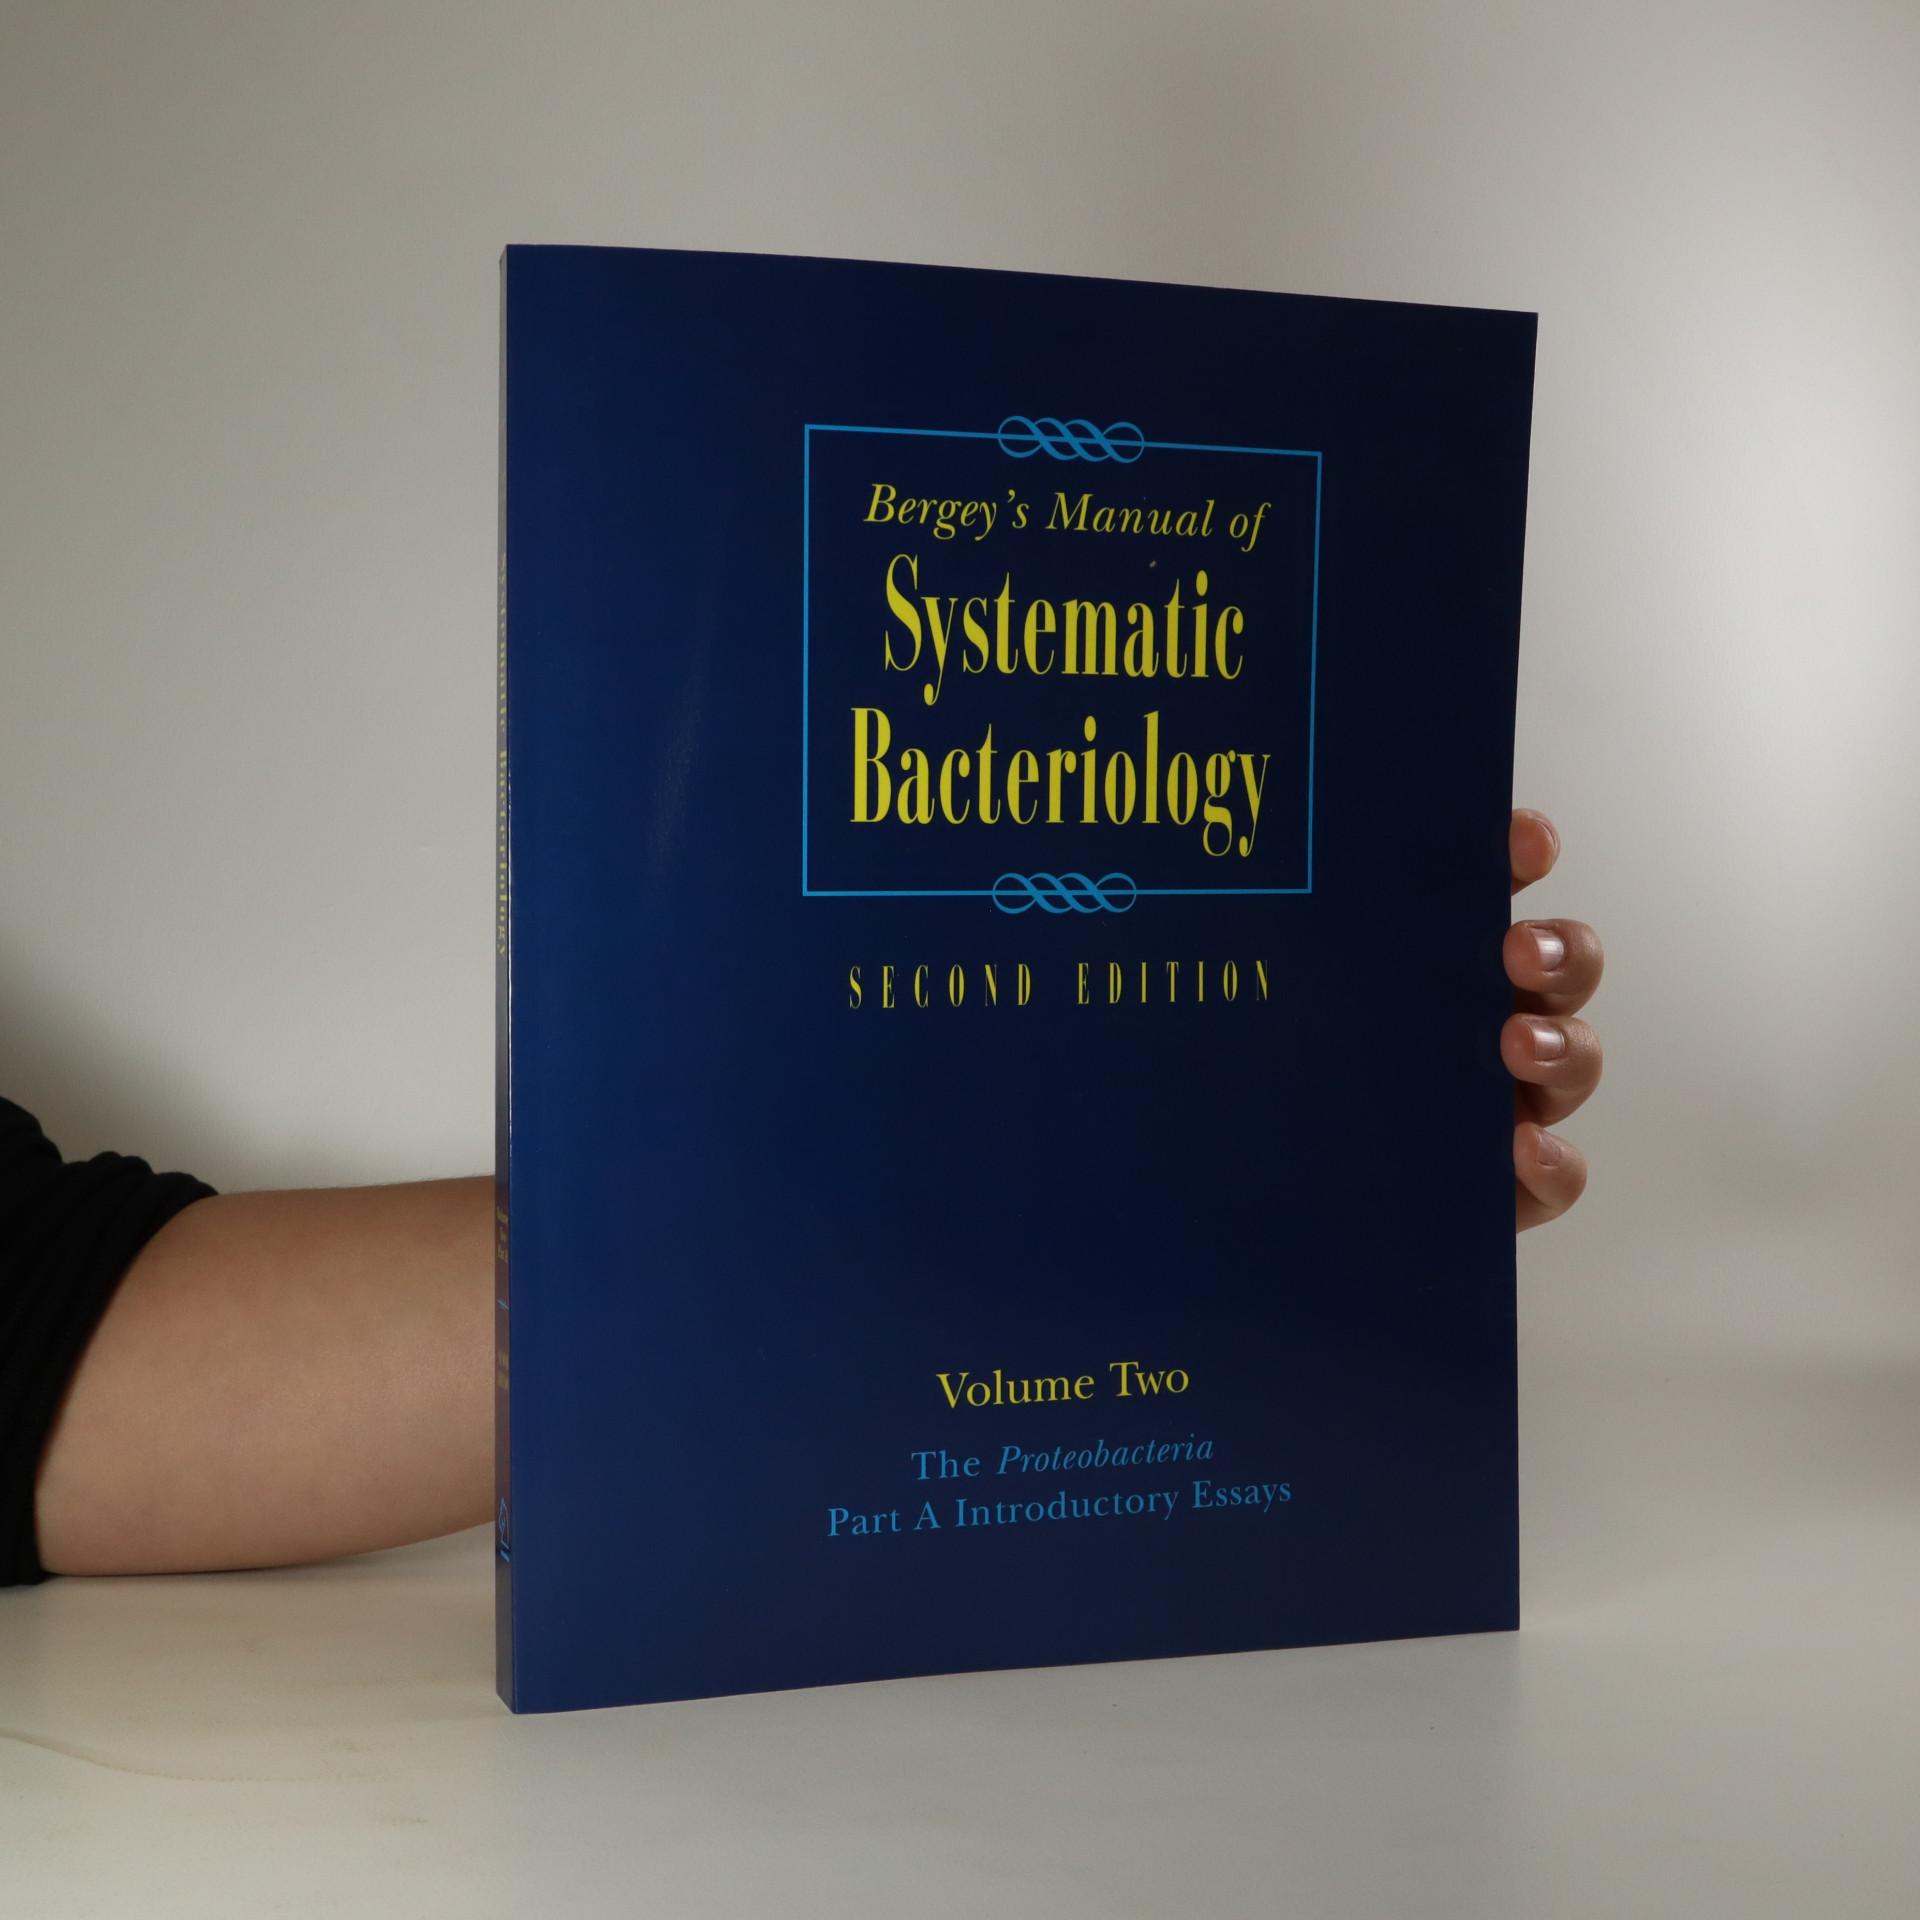 antikvární kniha Bergey's Manual of Systematic Bacteriology, neuveden